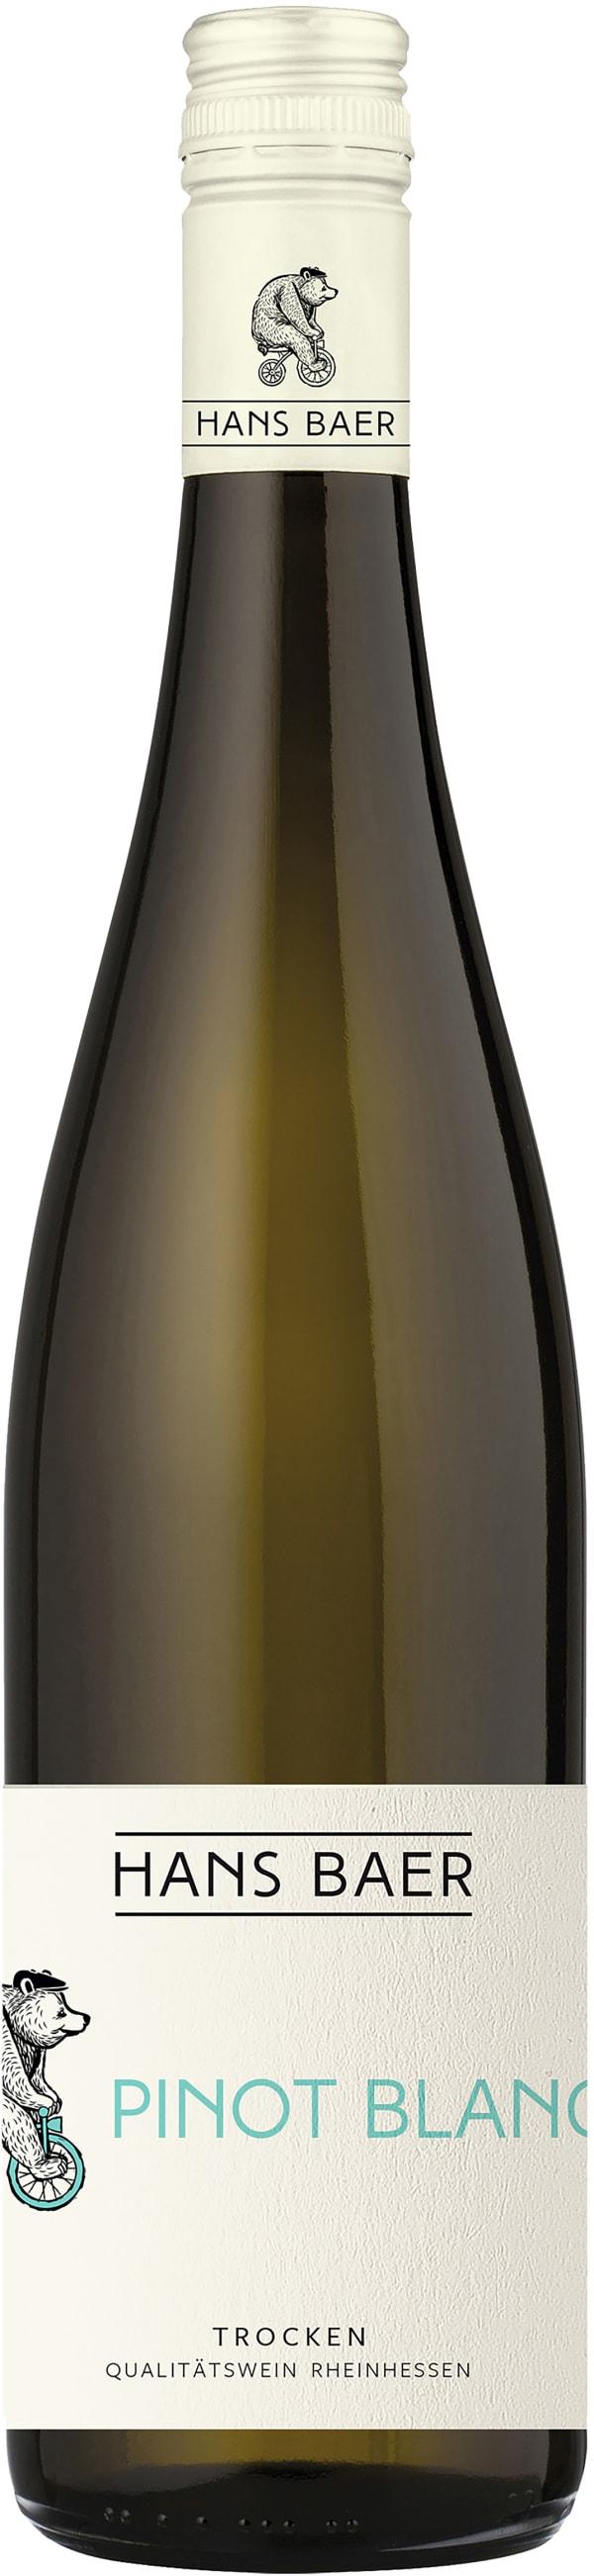 Hans Baer Pinot Blanc 2019